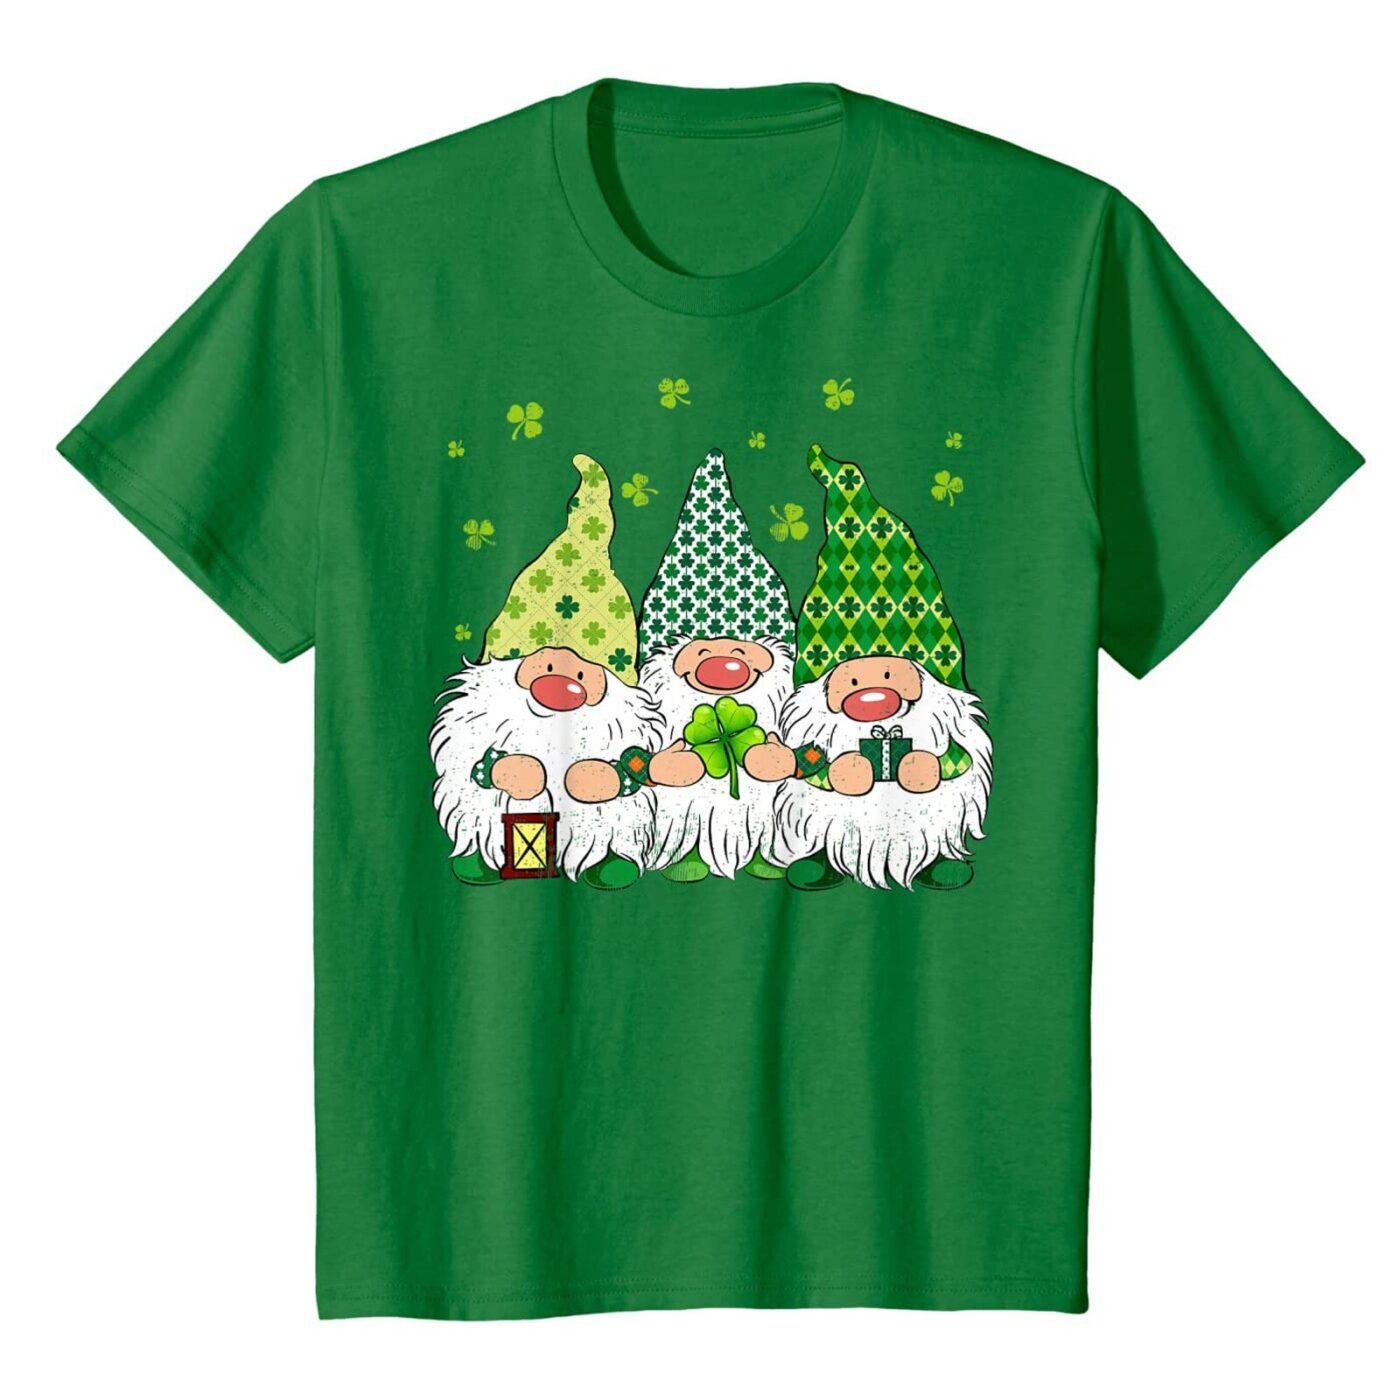 Women's Graphic Elements T Shirt